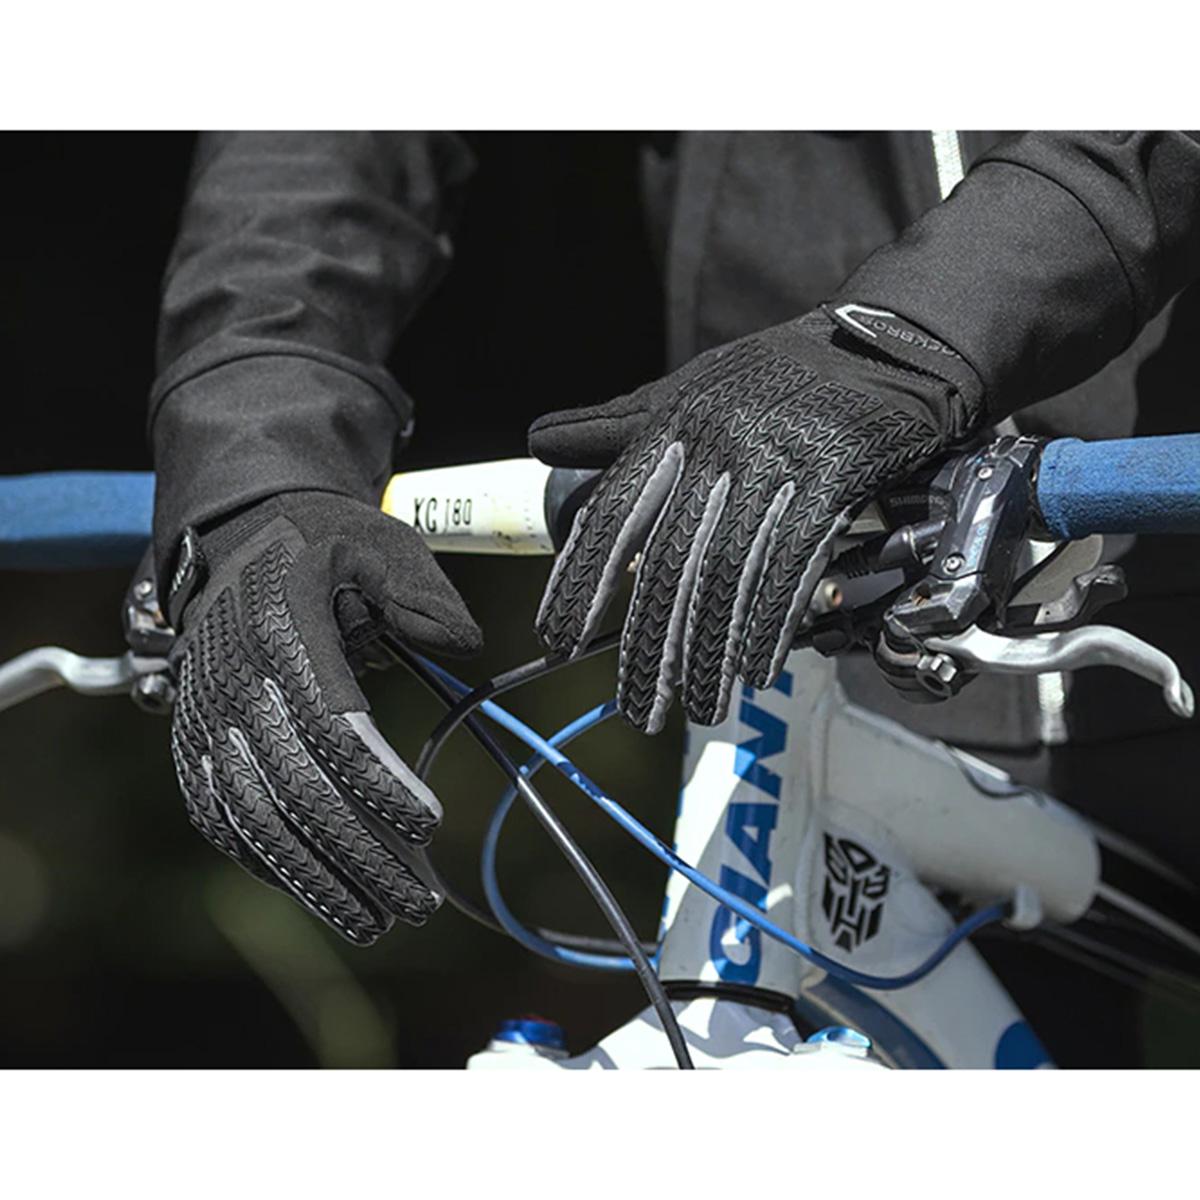 Luva de Gel Dedo Longo Ciclismo Esportiva Rockbros